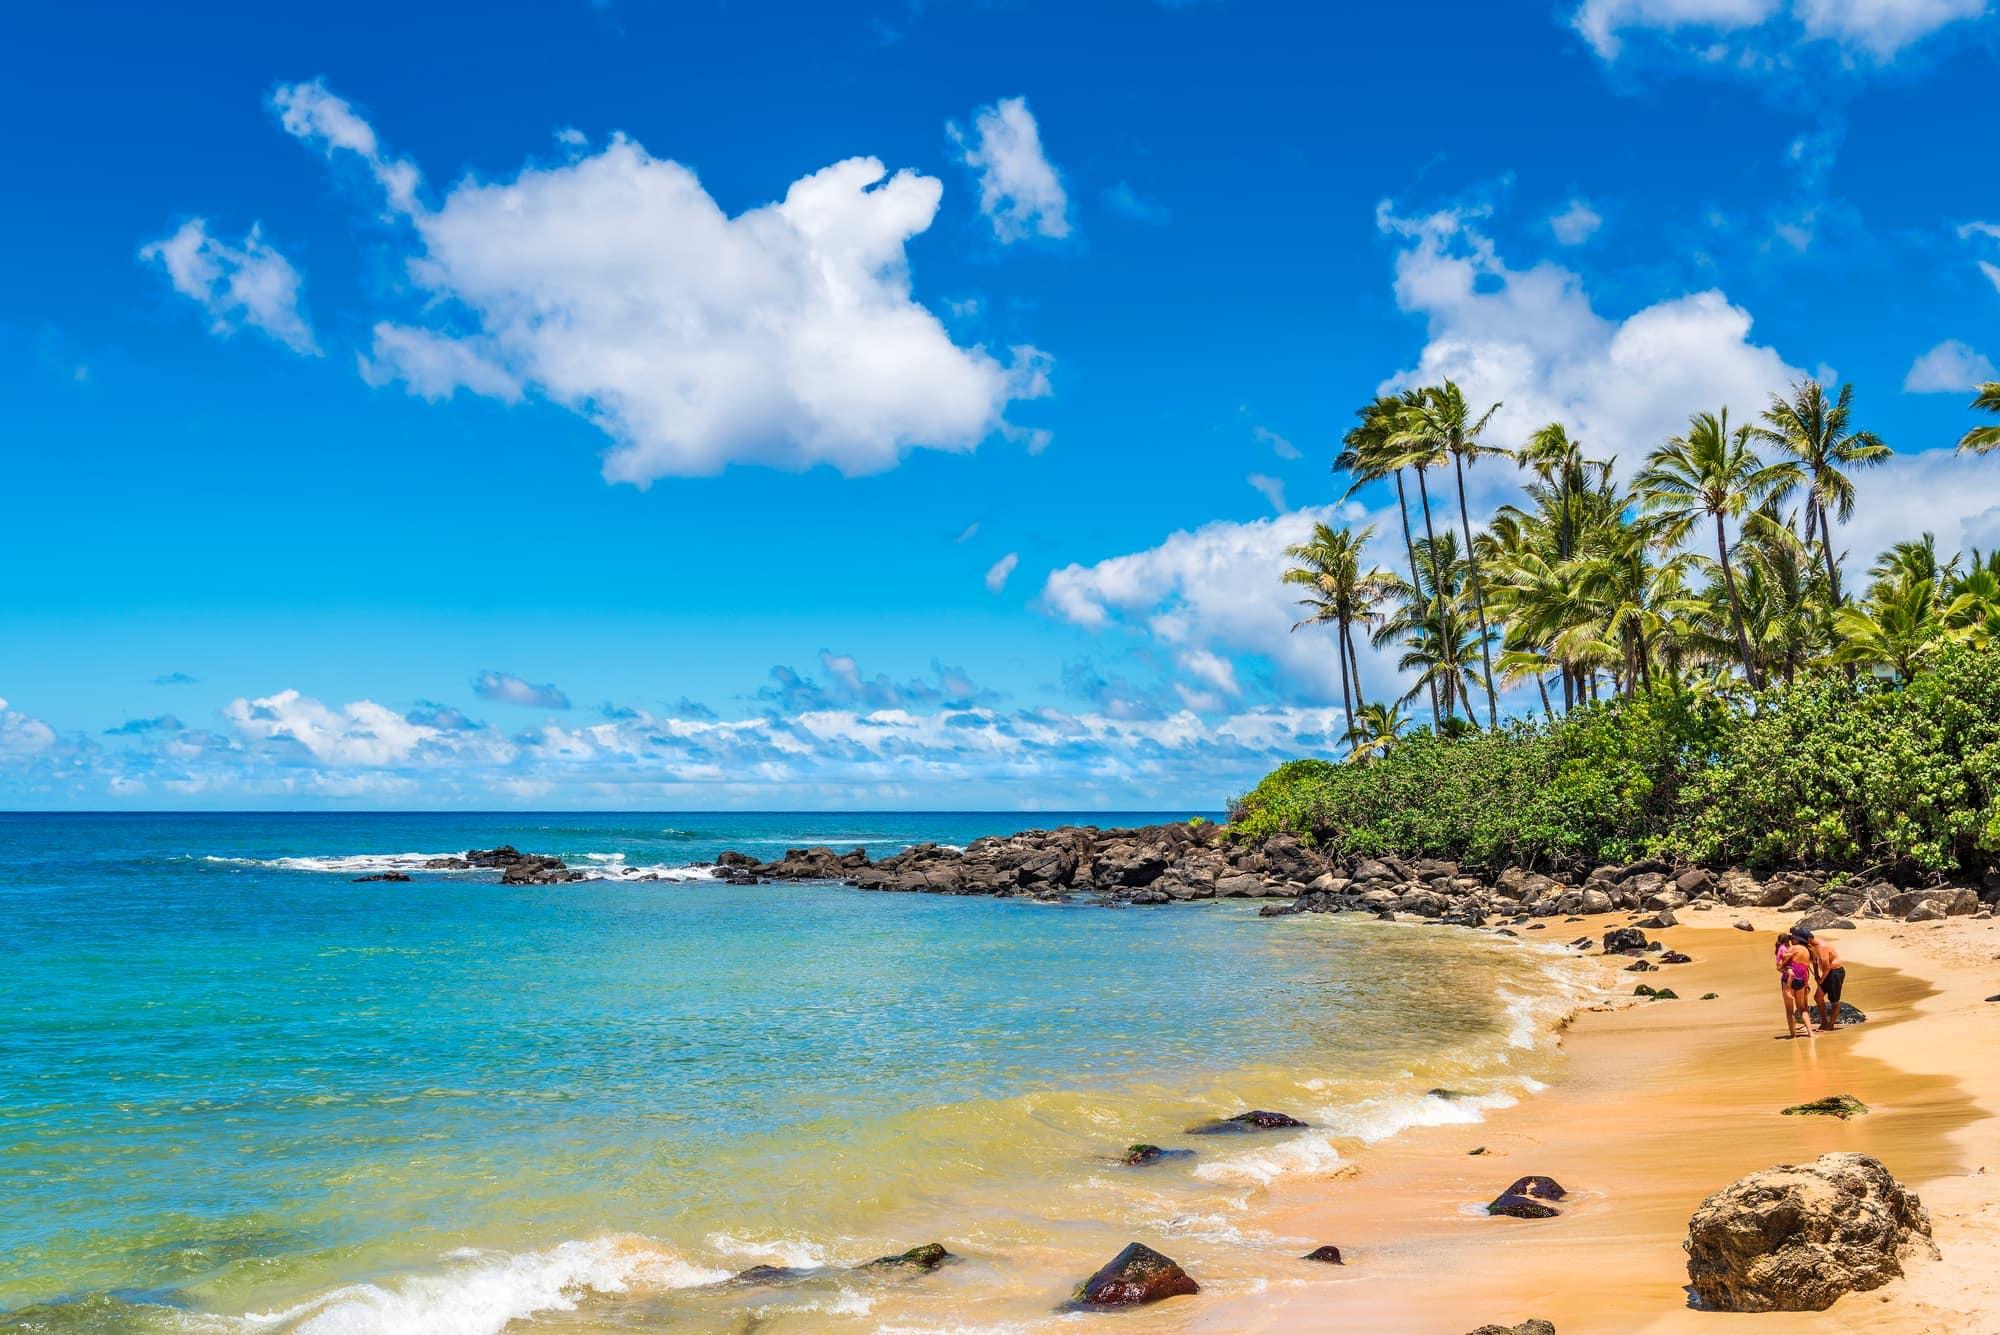 Our favorite beaches